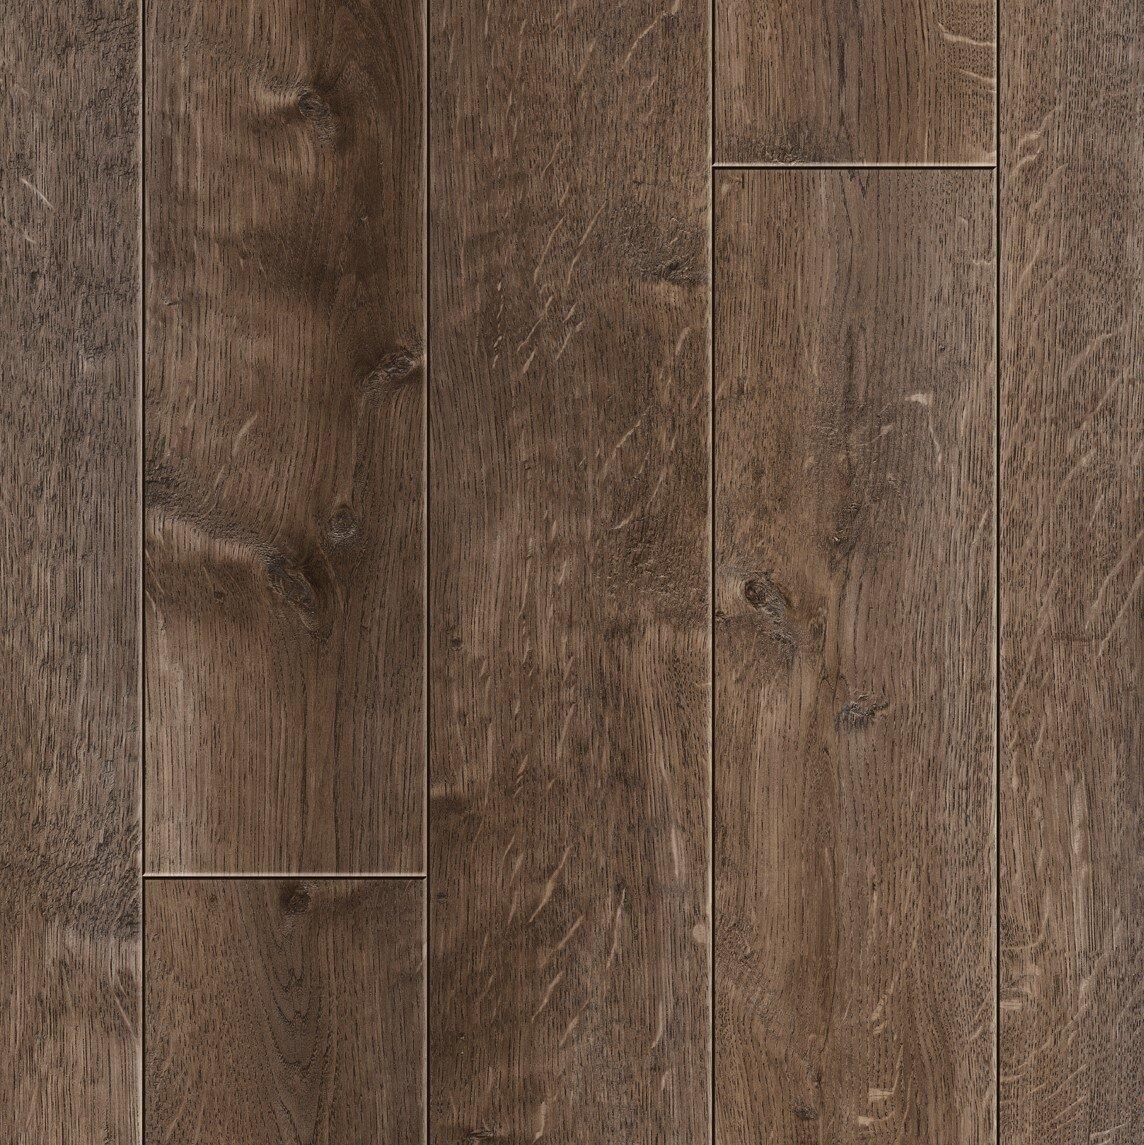 American Concepts 6 X 47 X 12mm Oak Laminate Flooring Wayfair